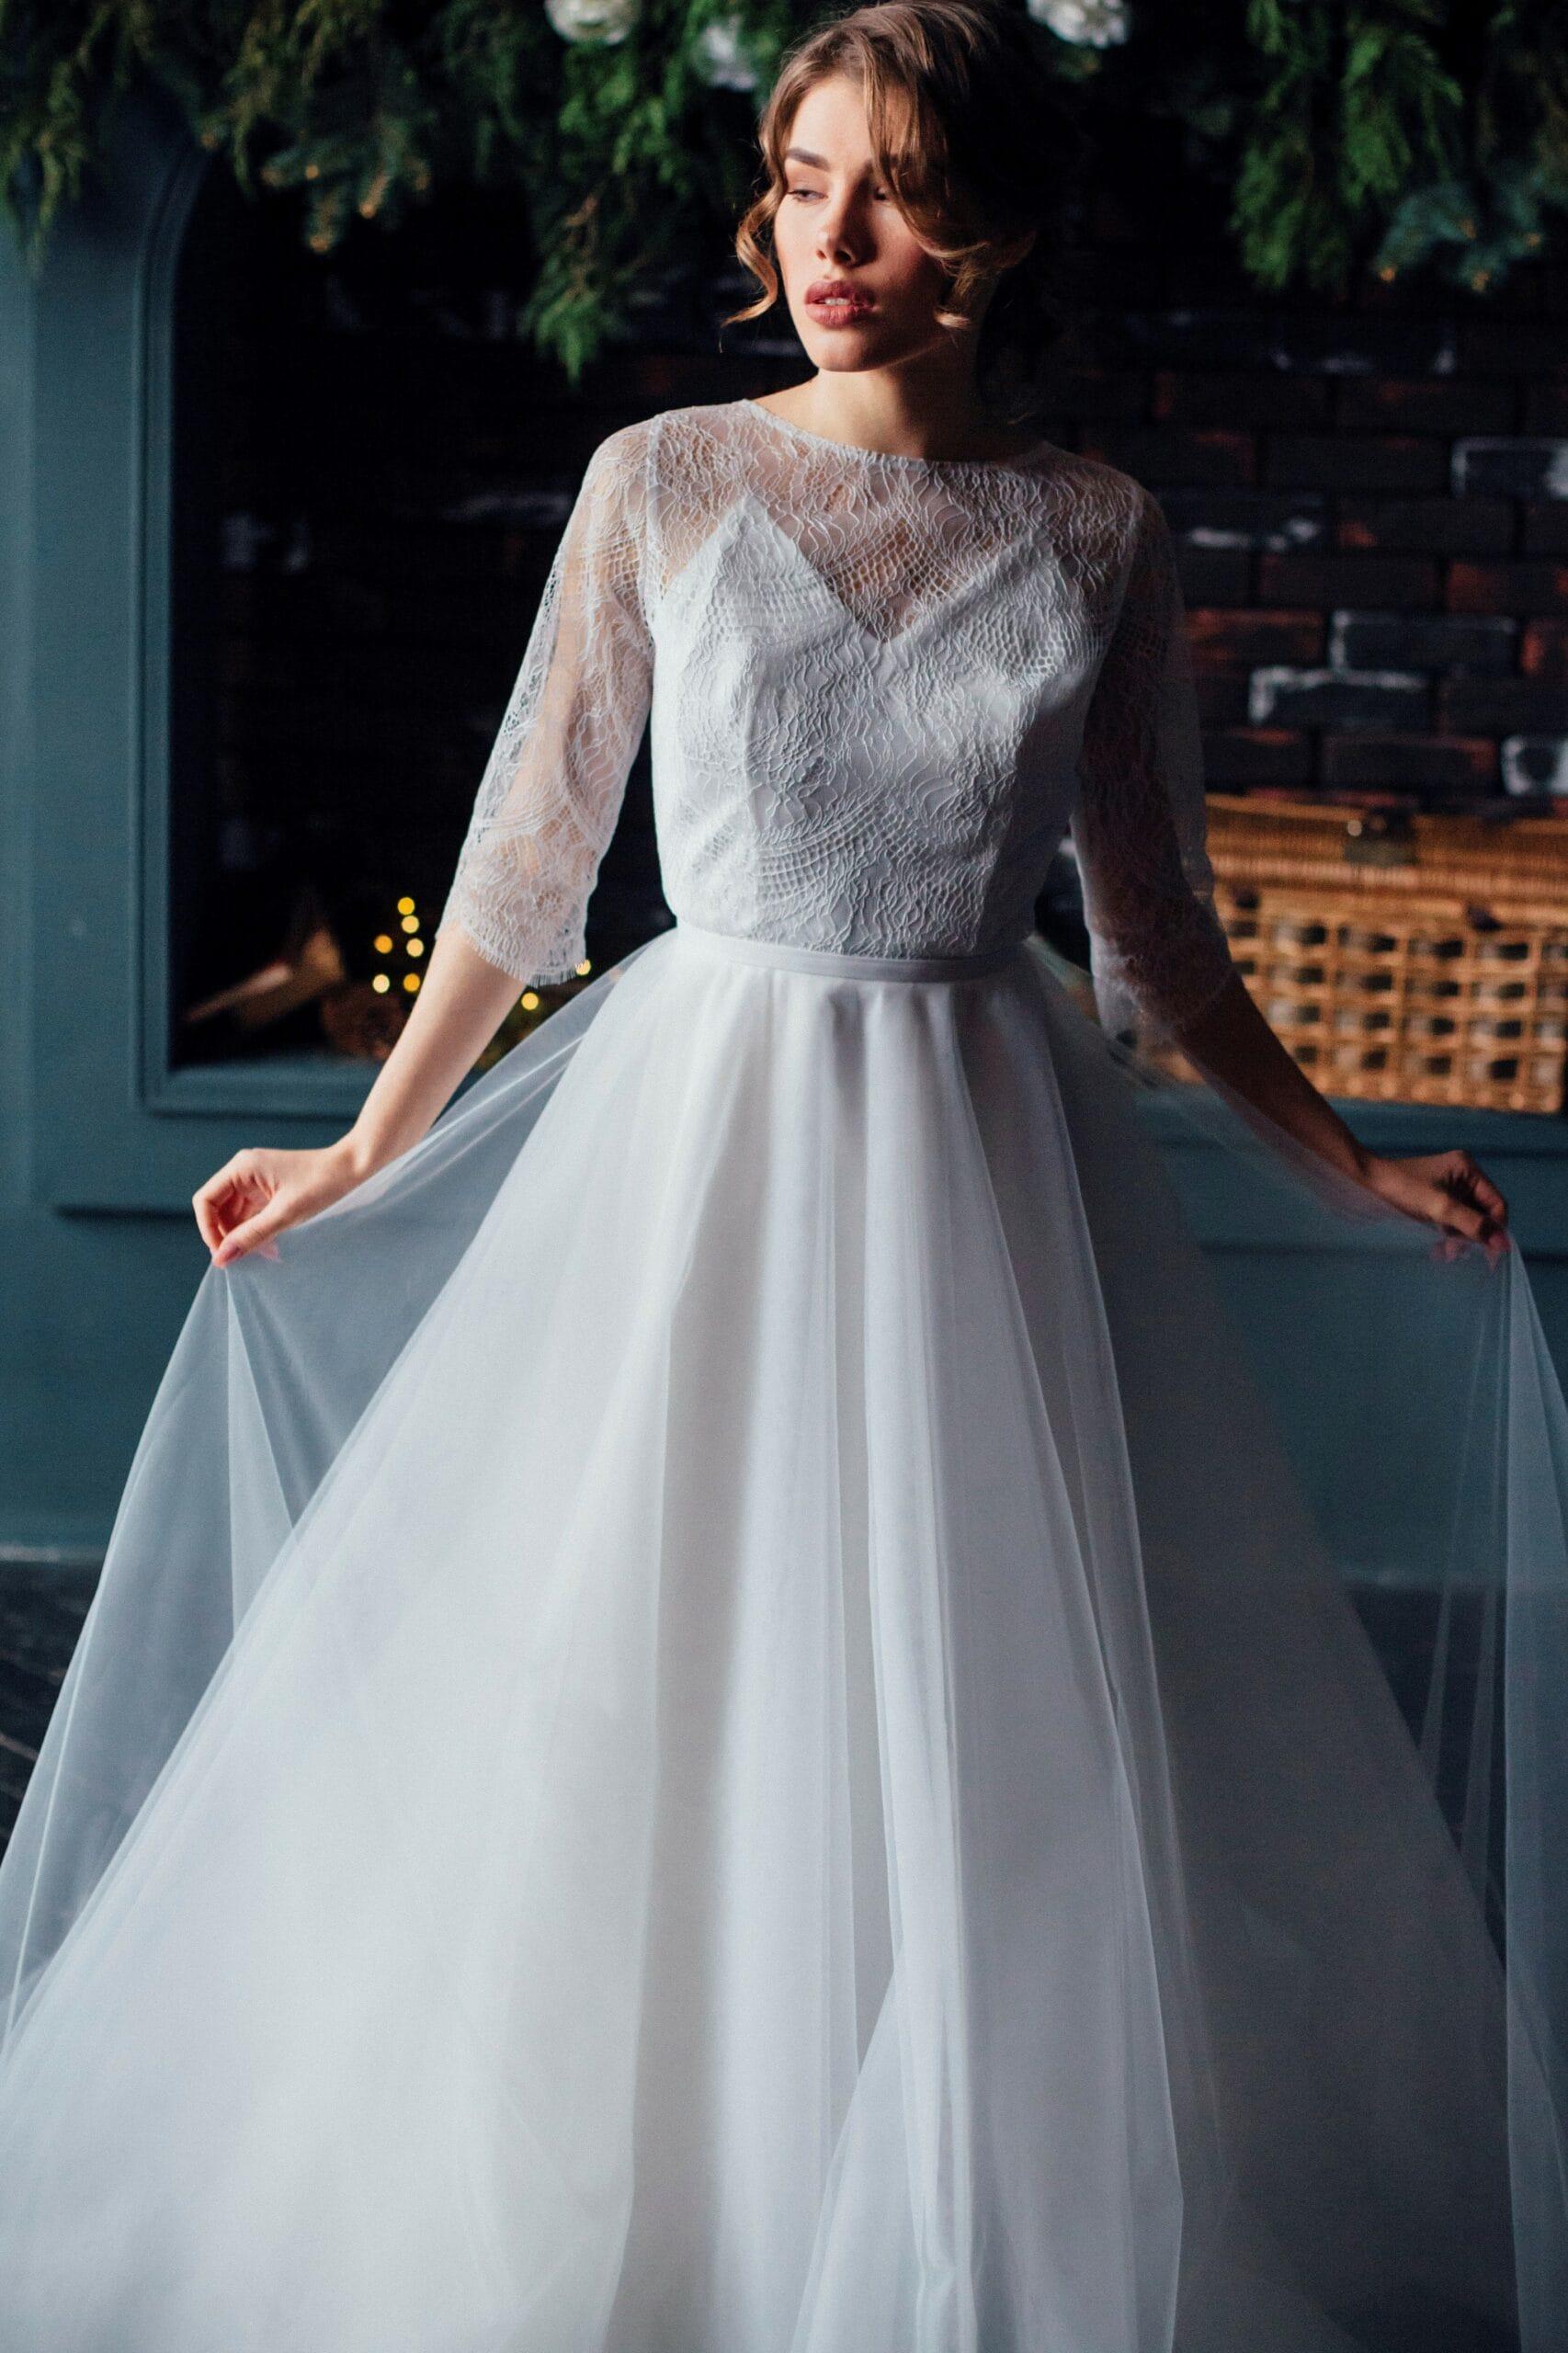 Свадебное платье DANIELLE, коллекция THE ABSOLUTE LOVE, бренд RARE BRIDAL, фото 1